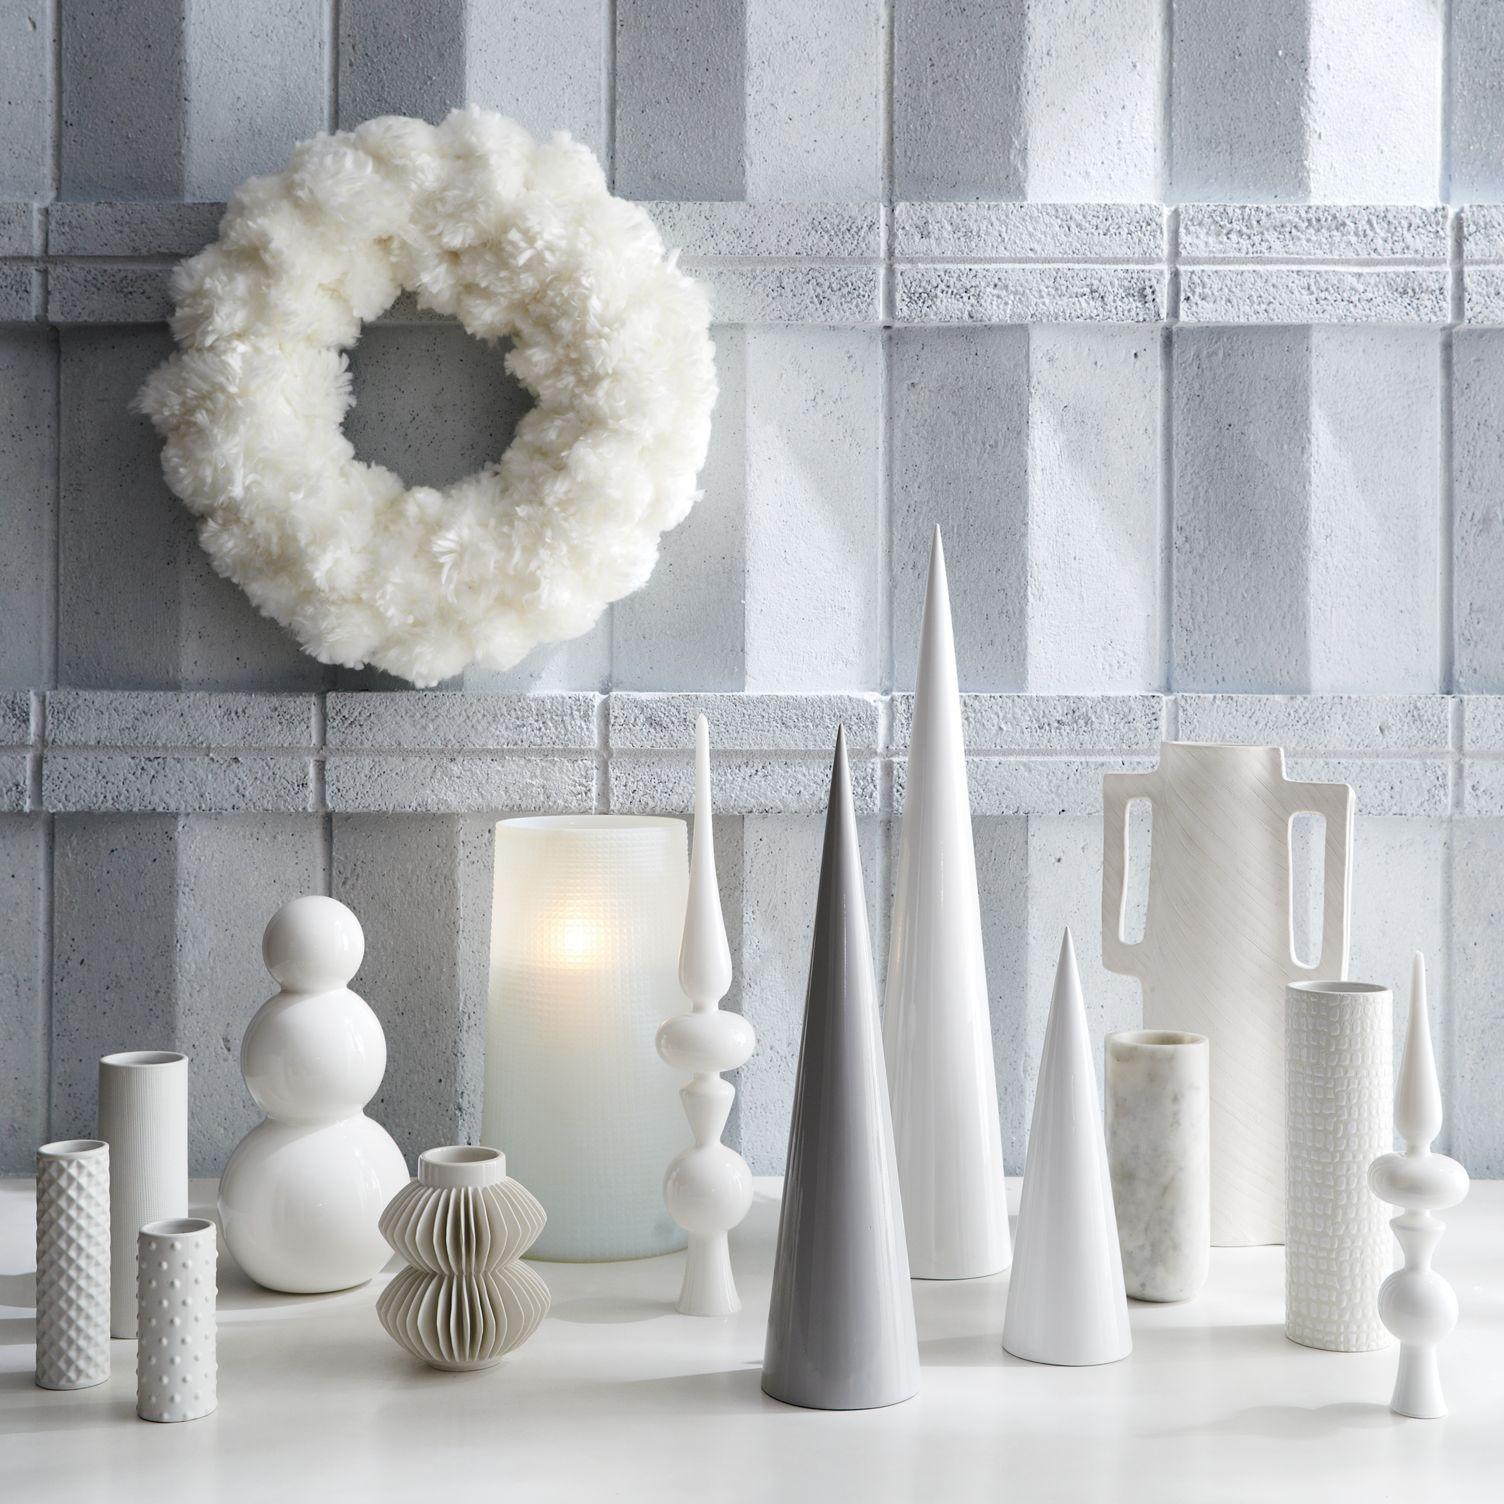 White Christmas decor from CB2